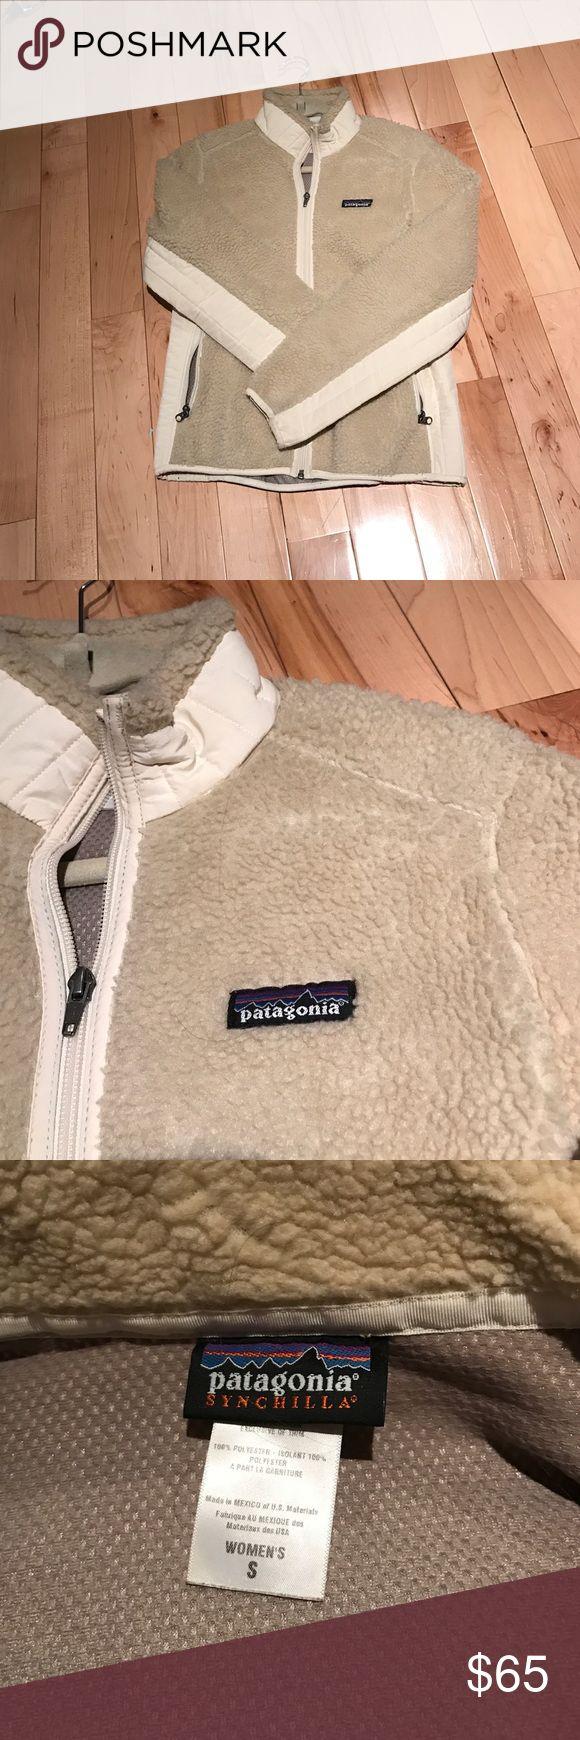 Patagonia Synchilla Jacket Small beige Patagonia Synchilla Jacket Patagonia Jackets & Coats